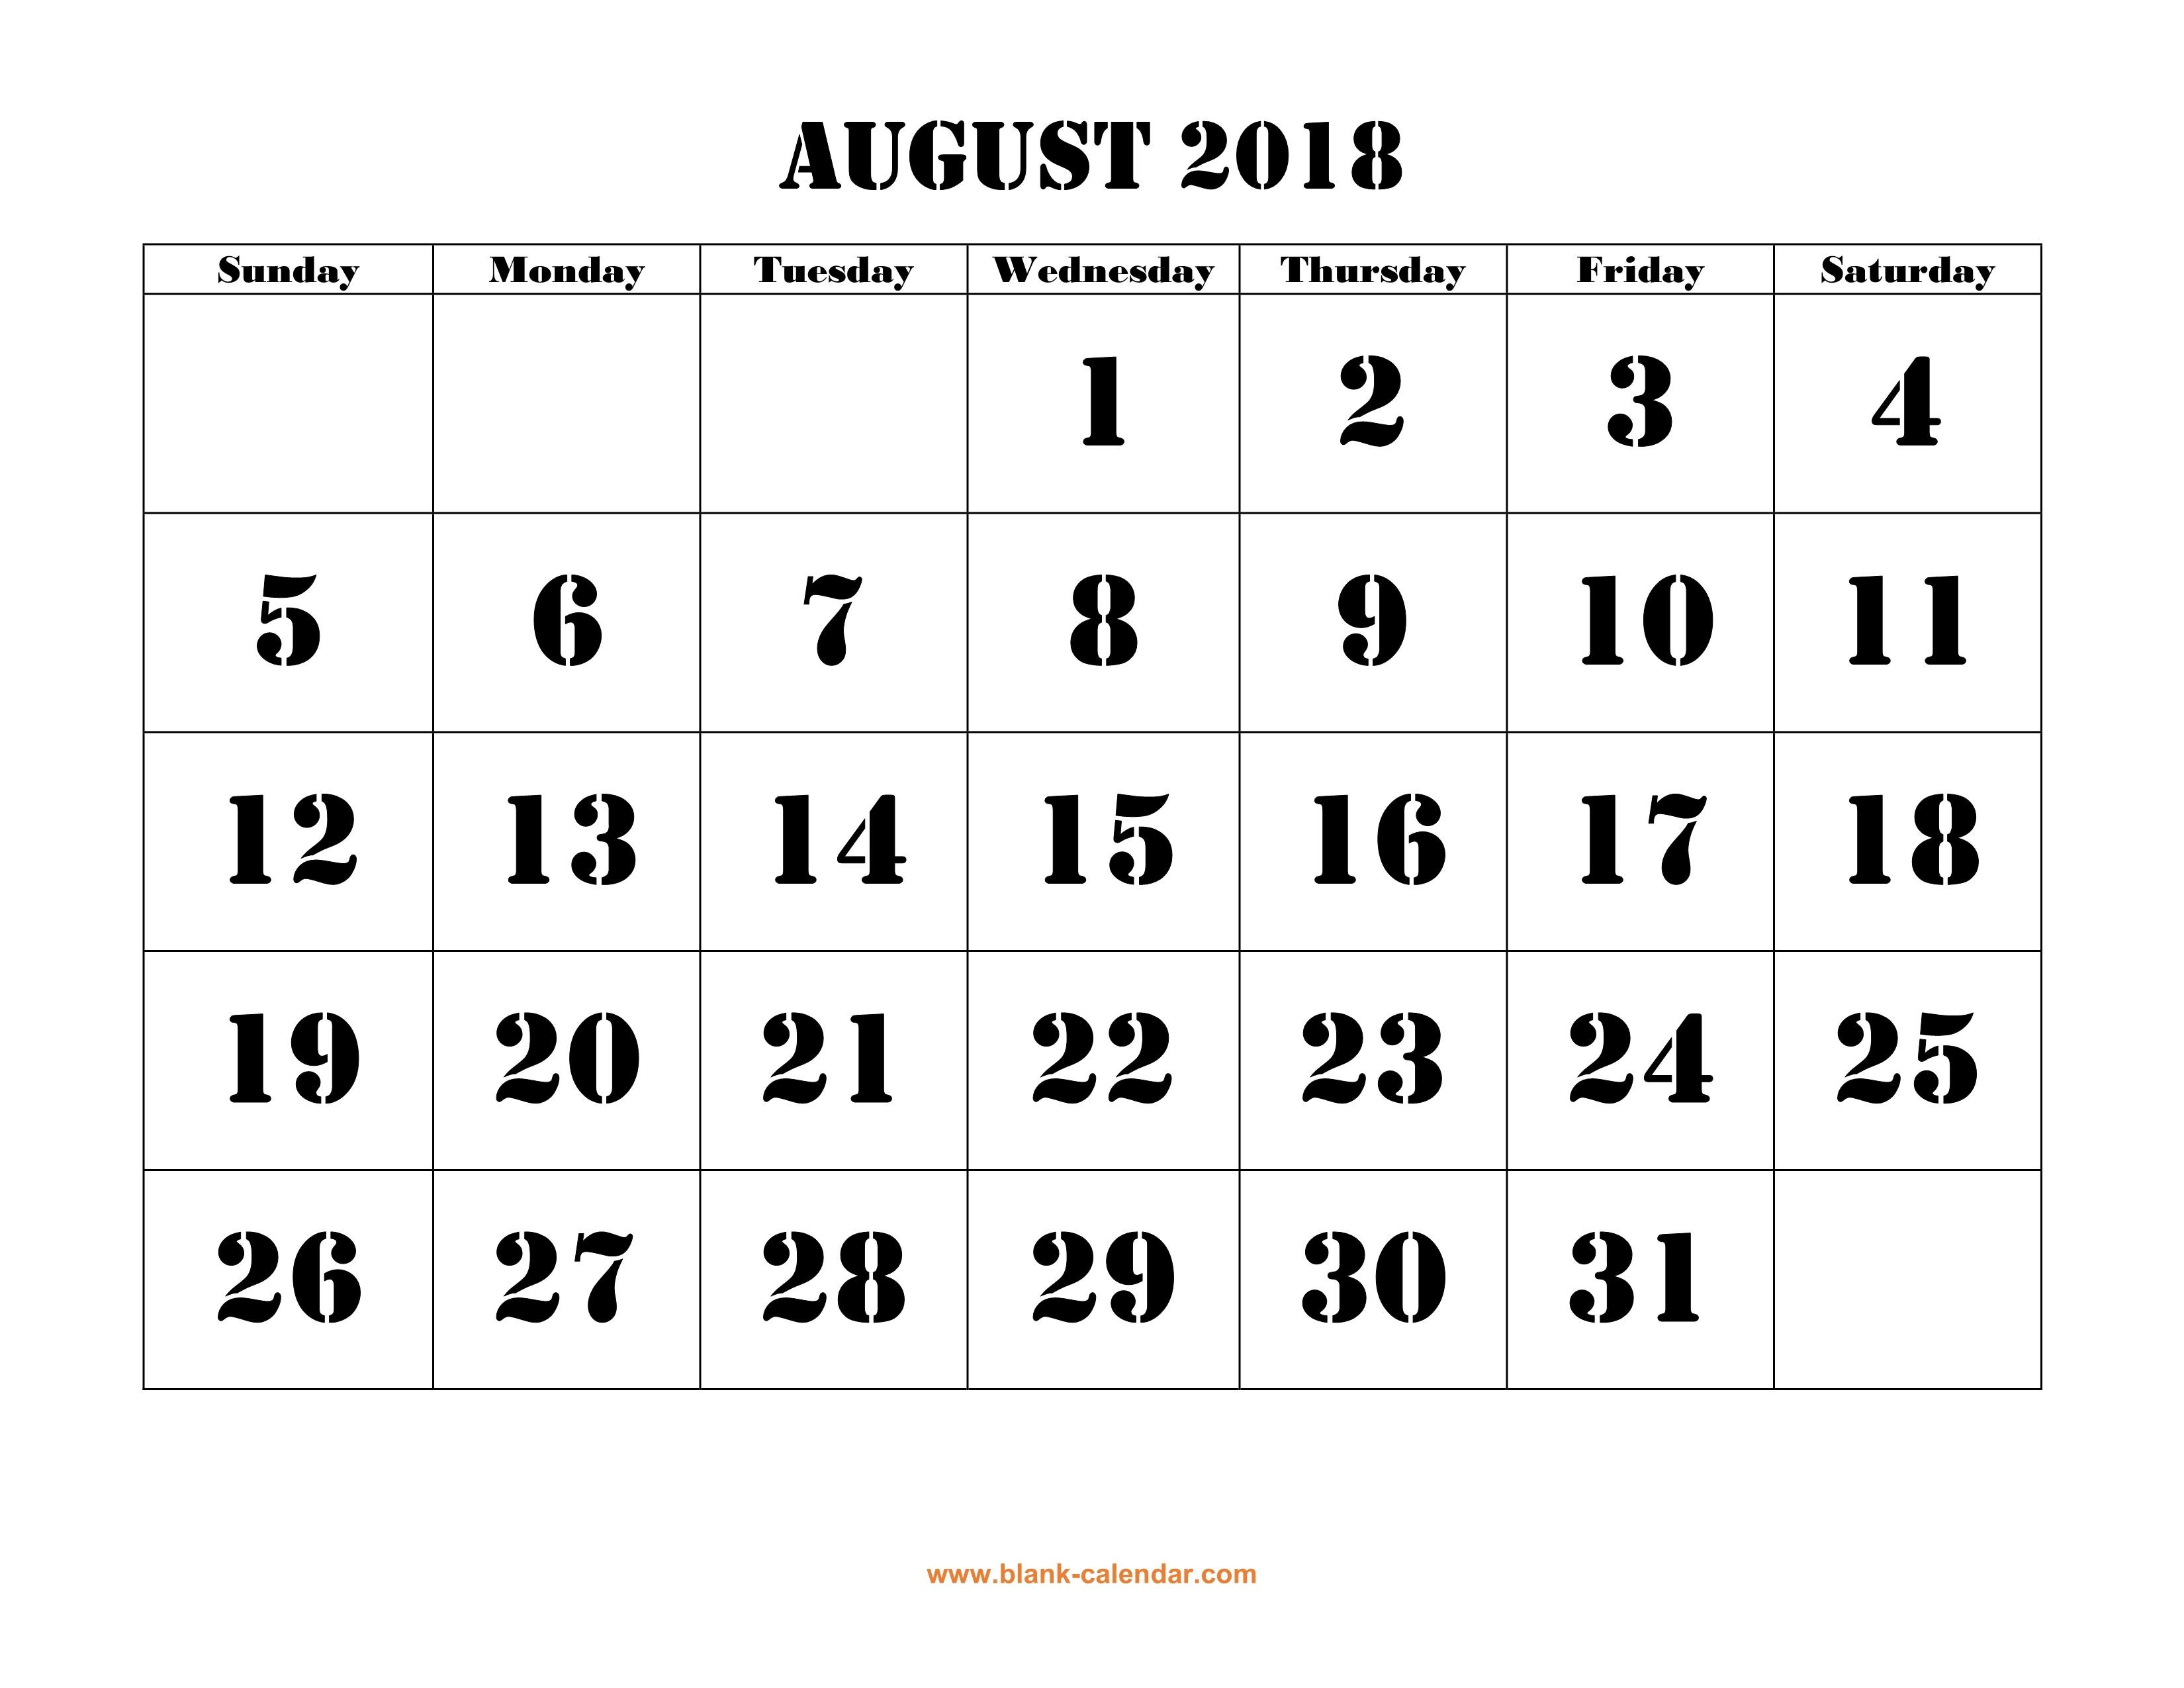 Free Download Printable August 2018 Calendar, Large Font Design - Large Printable Fonts Free